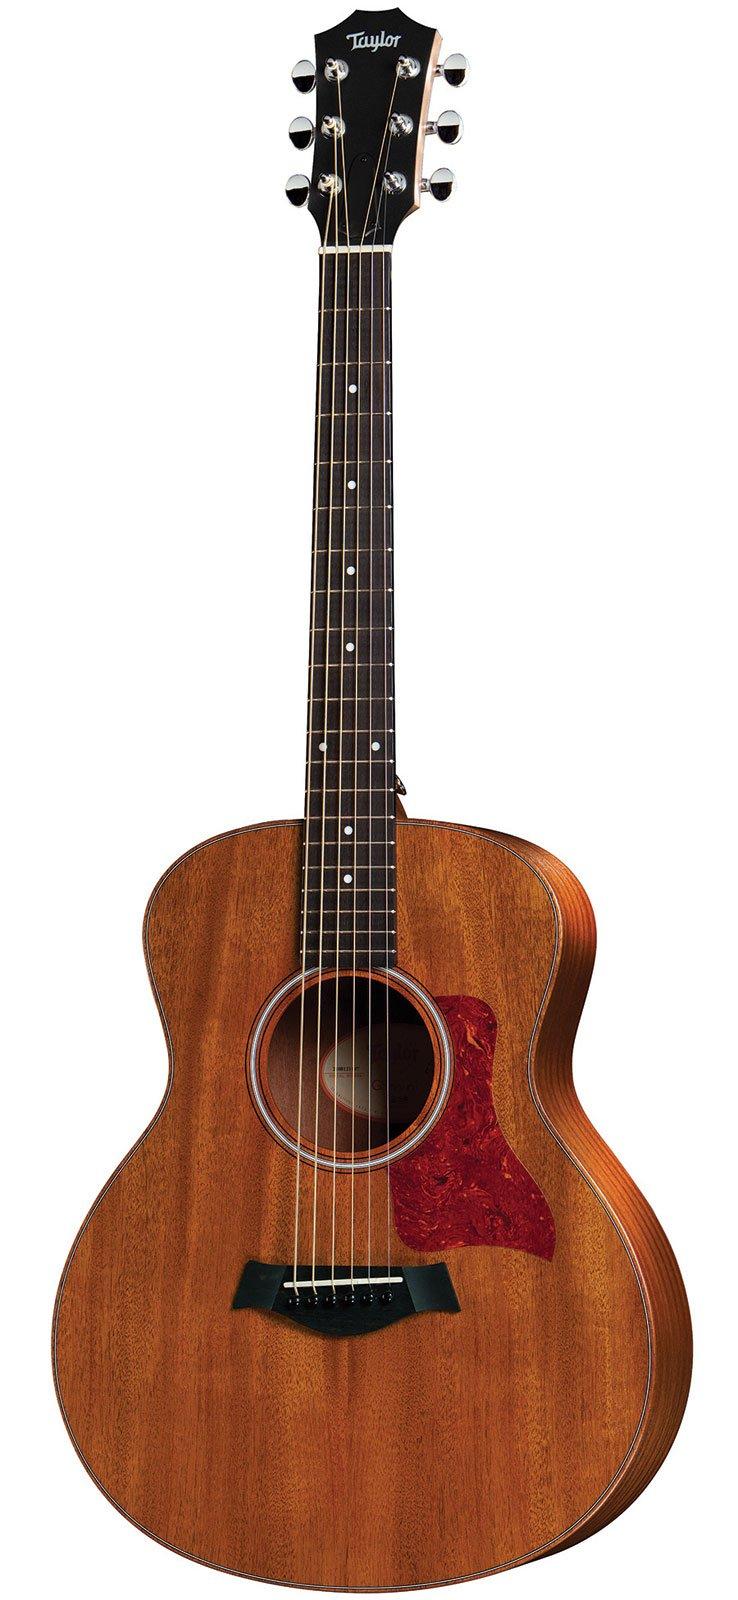 Taylor GS Mini Mahogany GS Mini Acoustic Guitar , Sapele, Mahogany Top by Taylor Guitars